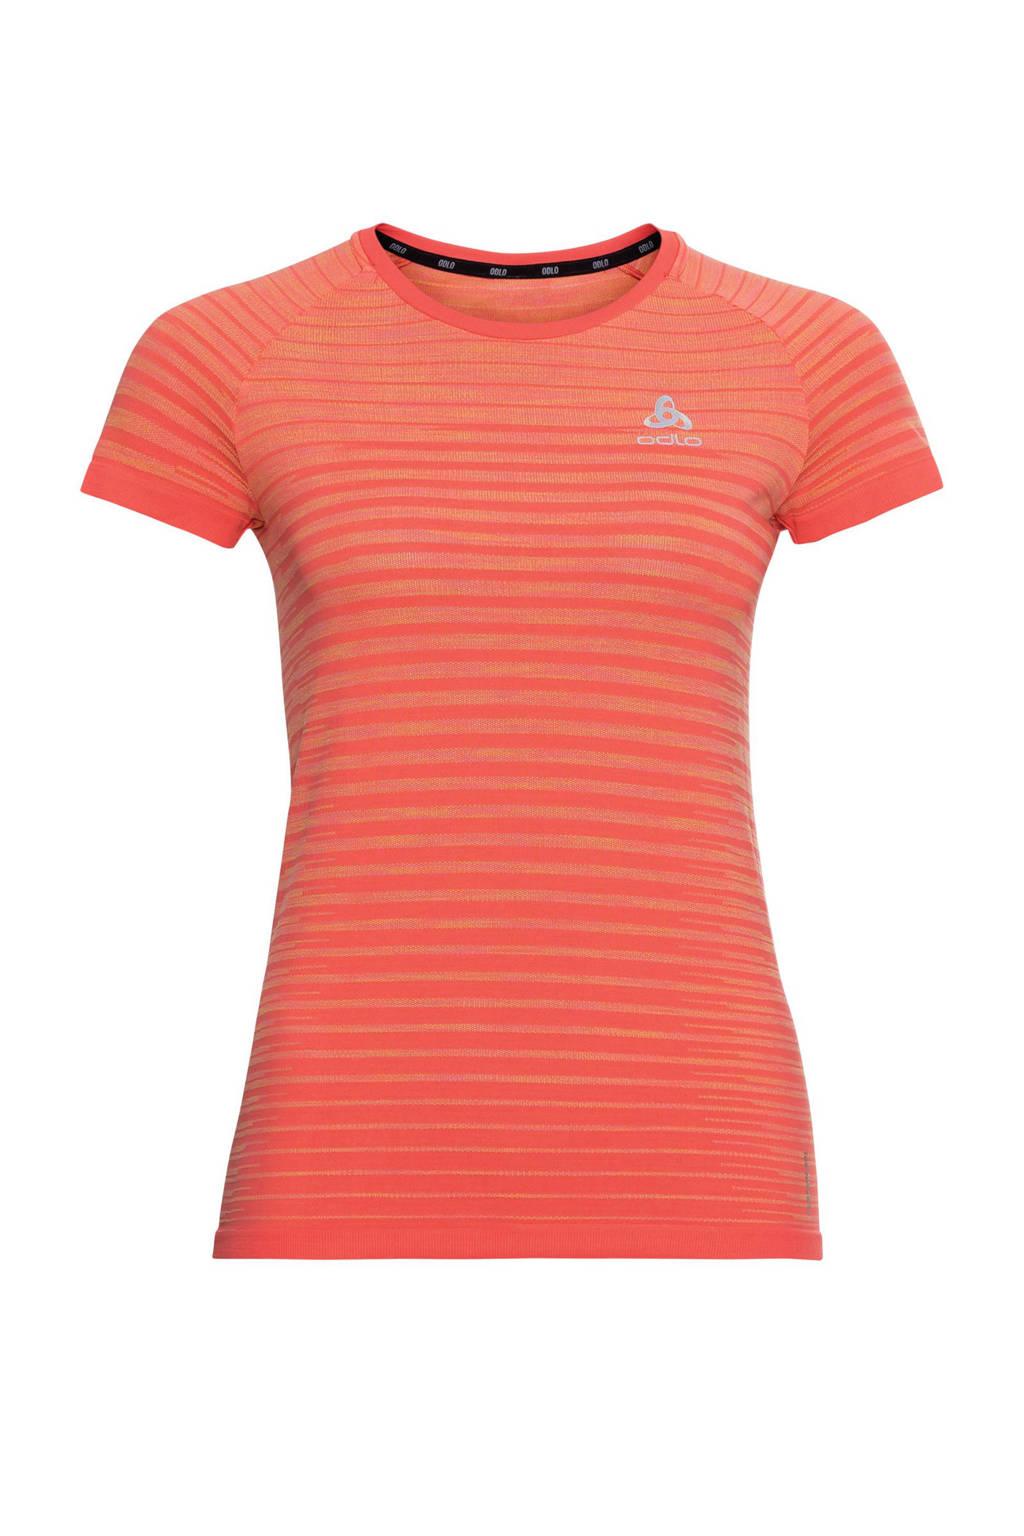 Odlo hardloopshirt oranje, Oranje